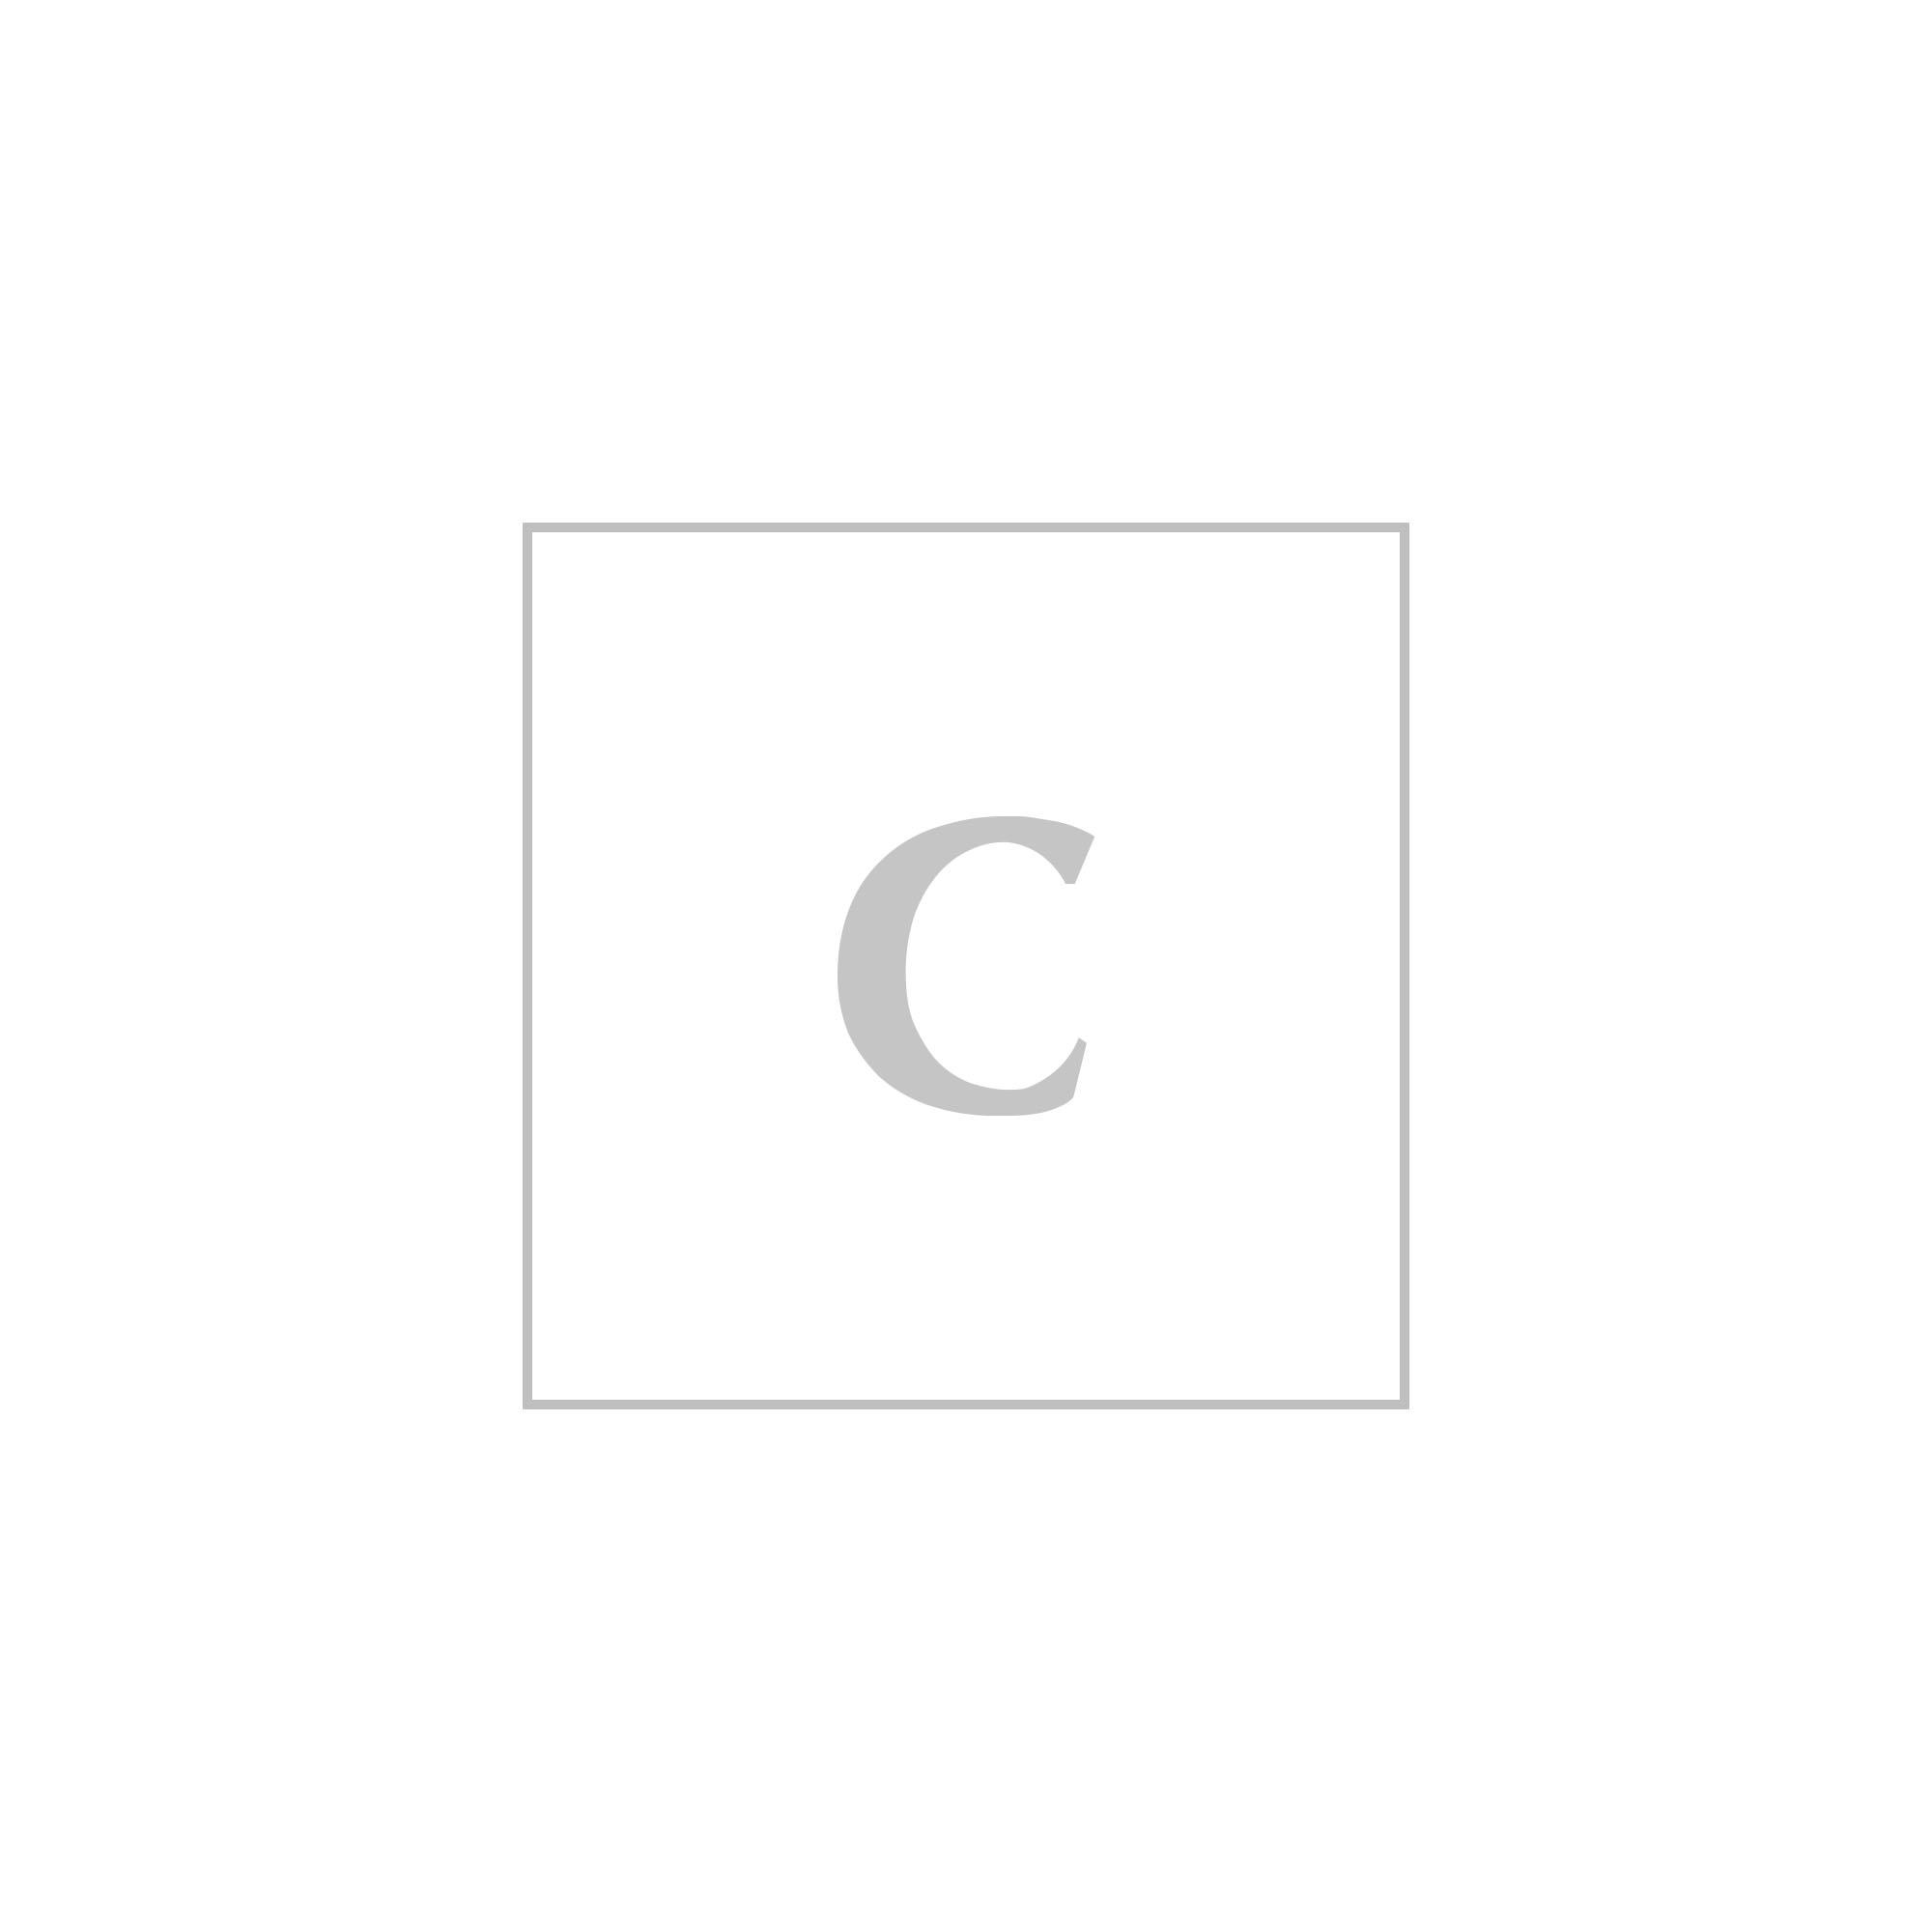 Christian Dior borsa lady dior croisiere iridescent pat